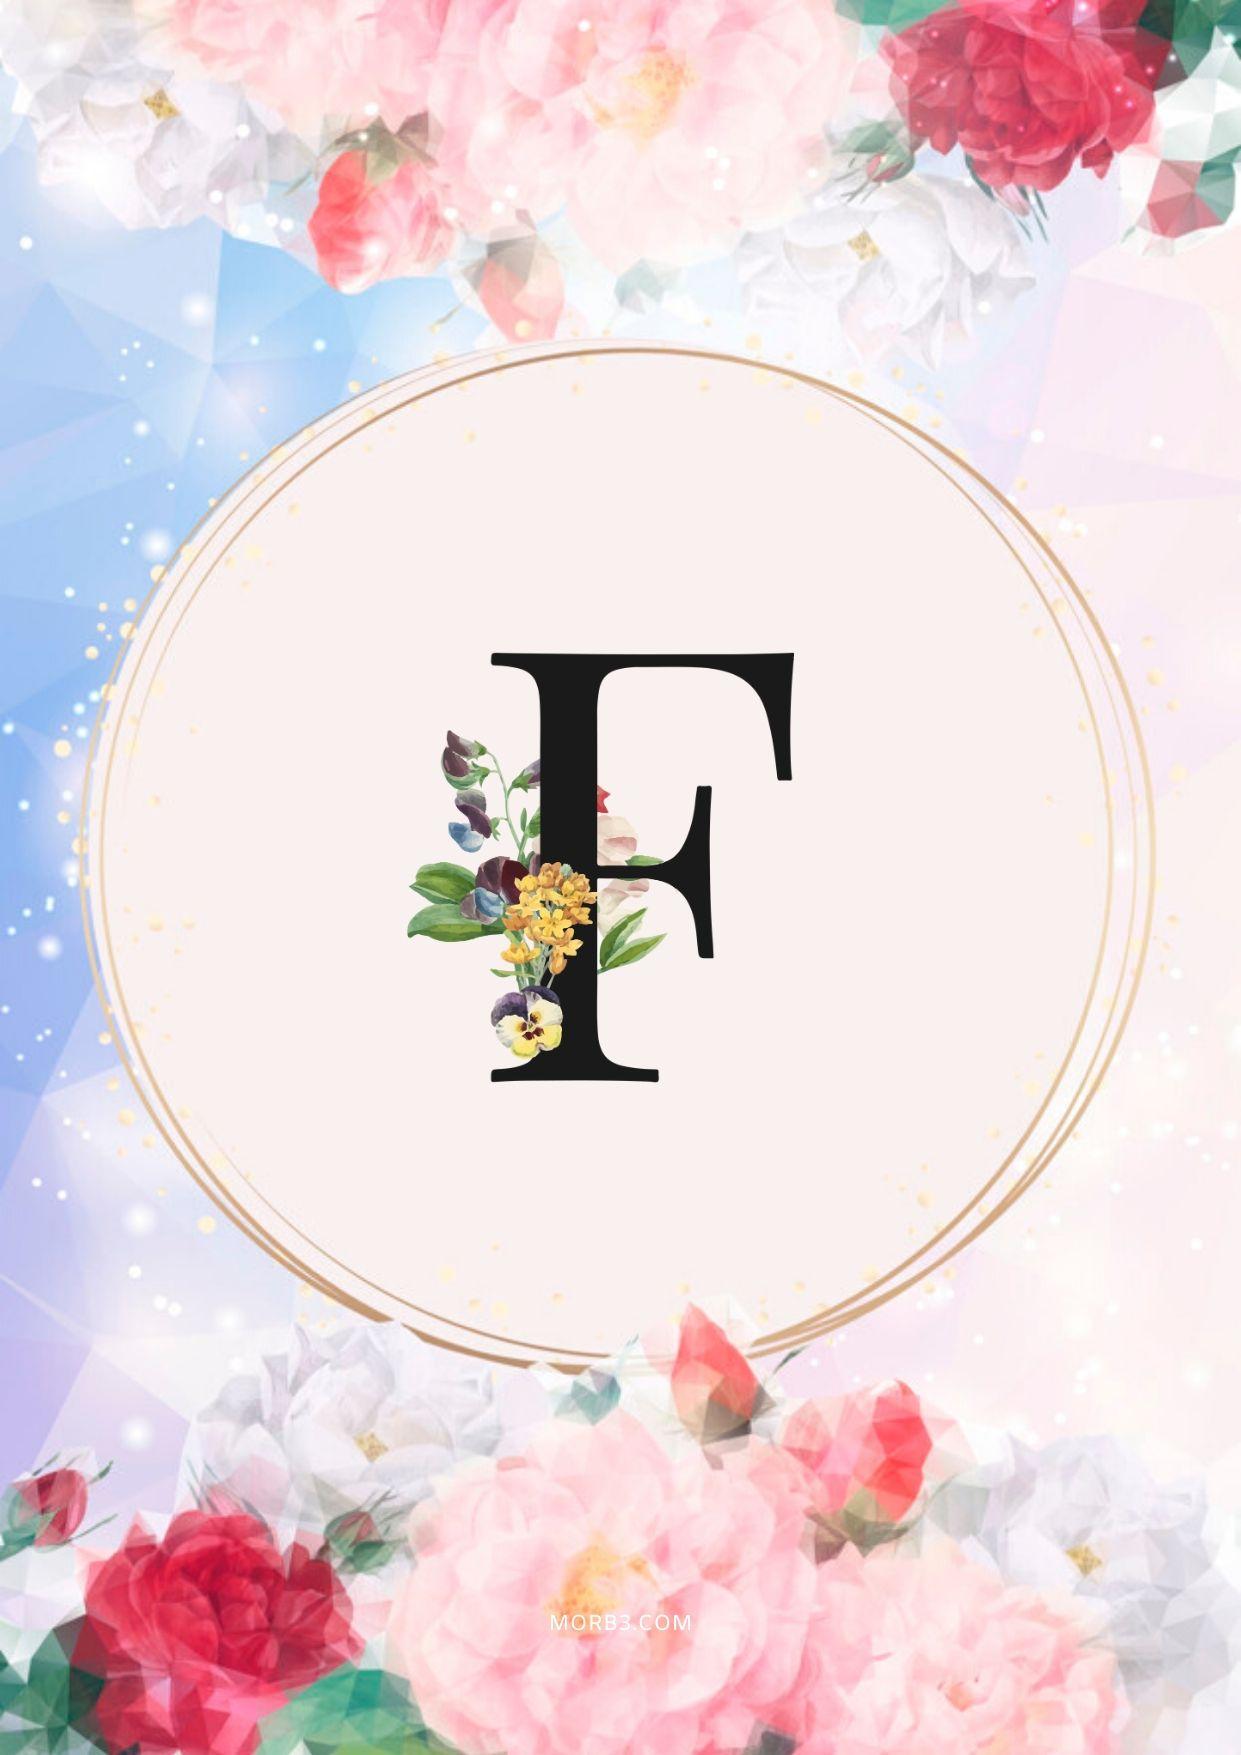 صور حرف F خلفيات حرف F خلفيات حرف F رومانسية اجمل حرف F في العالم حرف F بالورد حرف F احبك حرف F في قلوب حرف F مع كلام حب خلفيات حرف